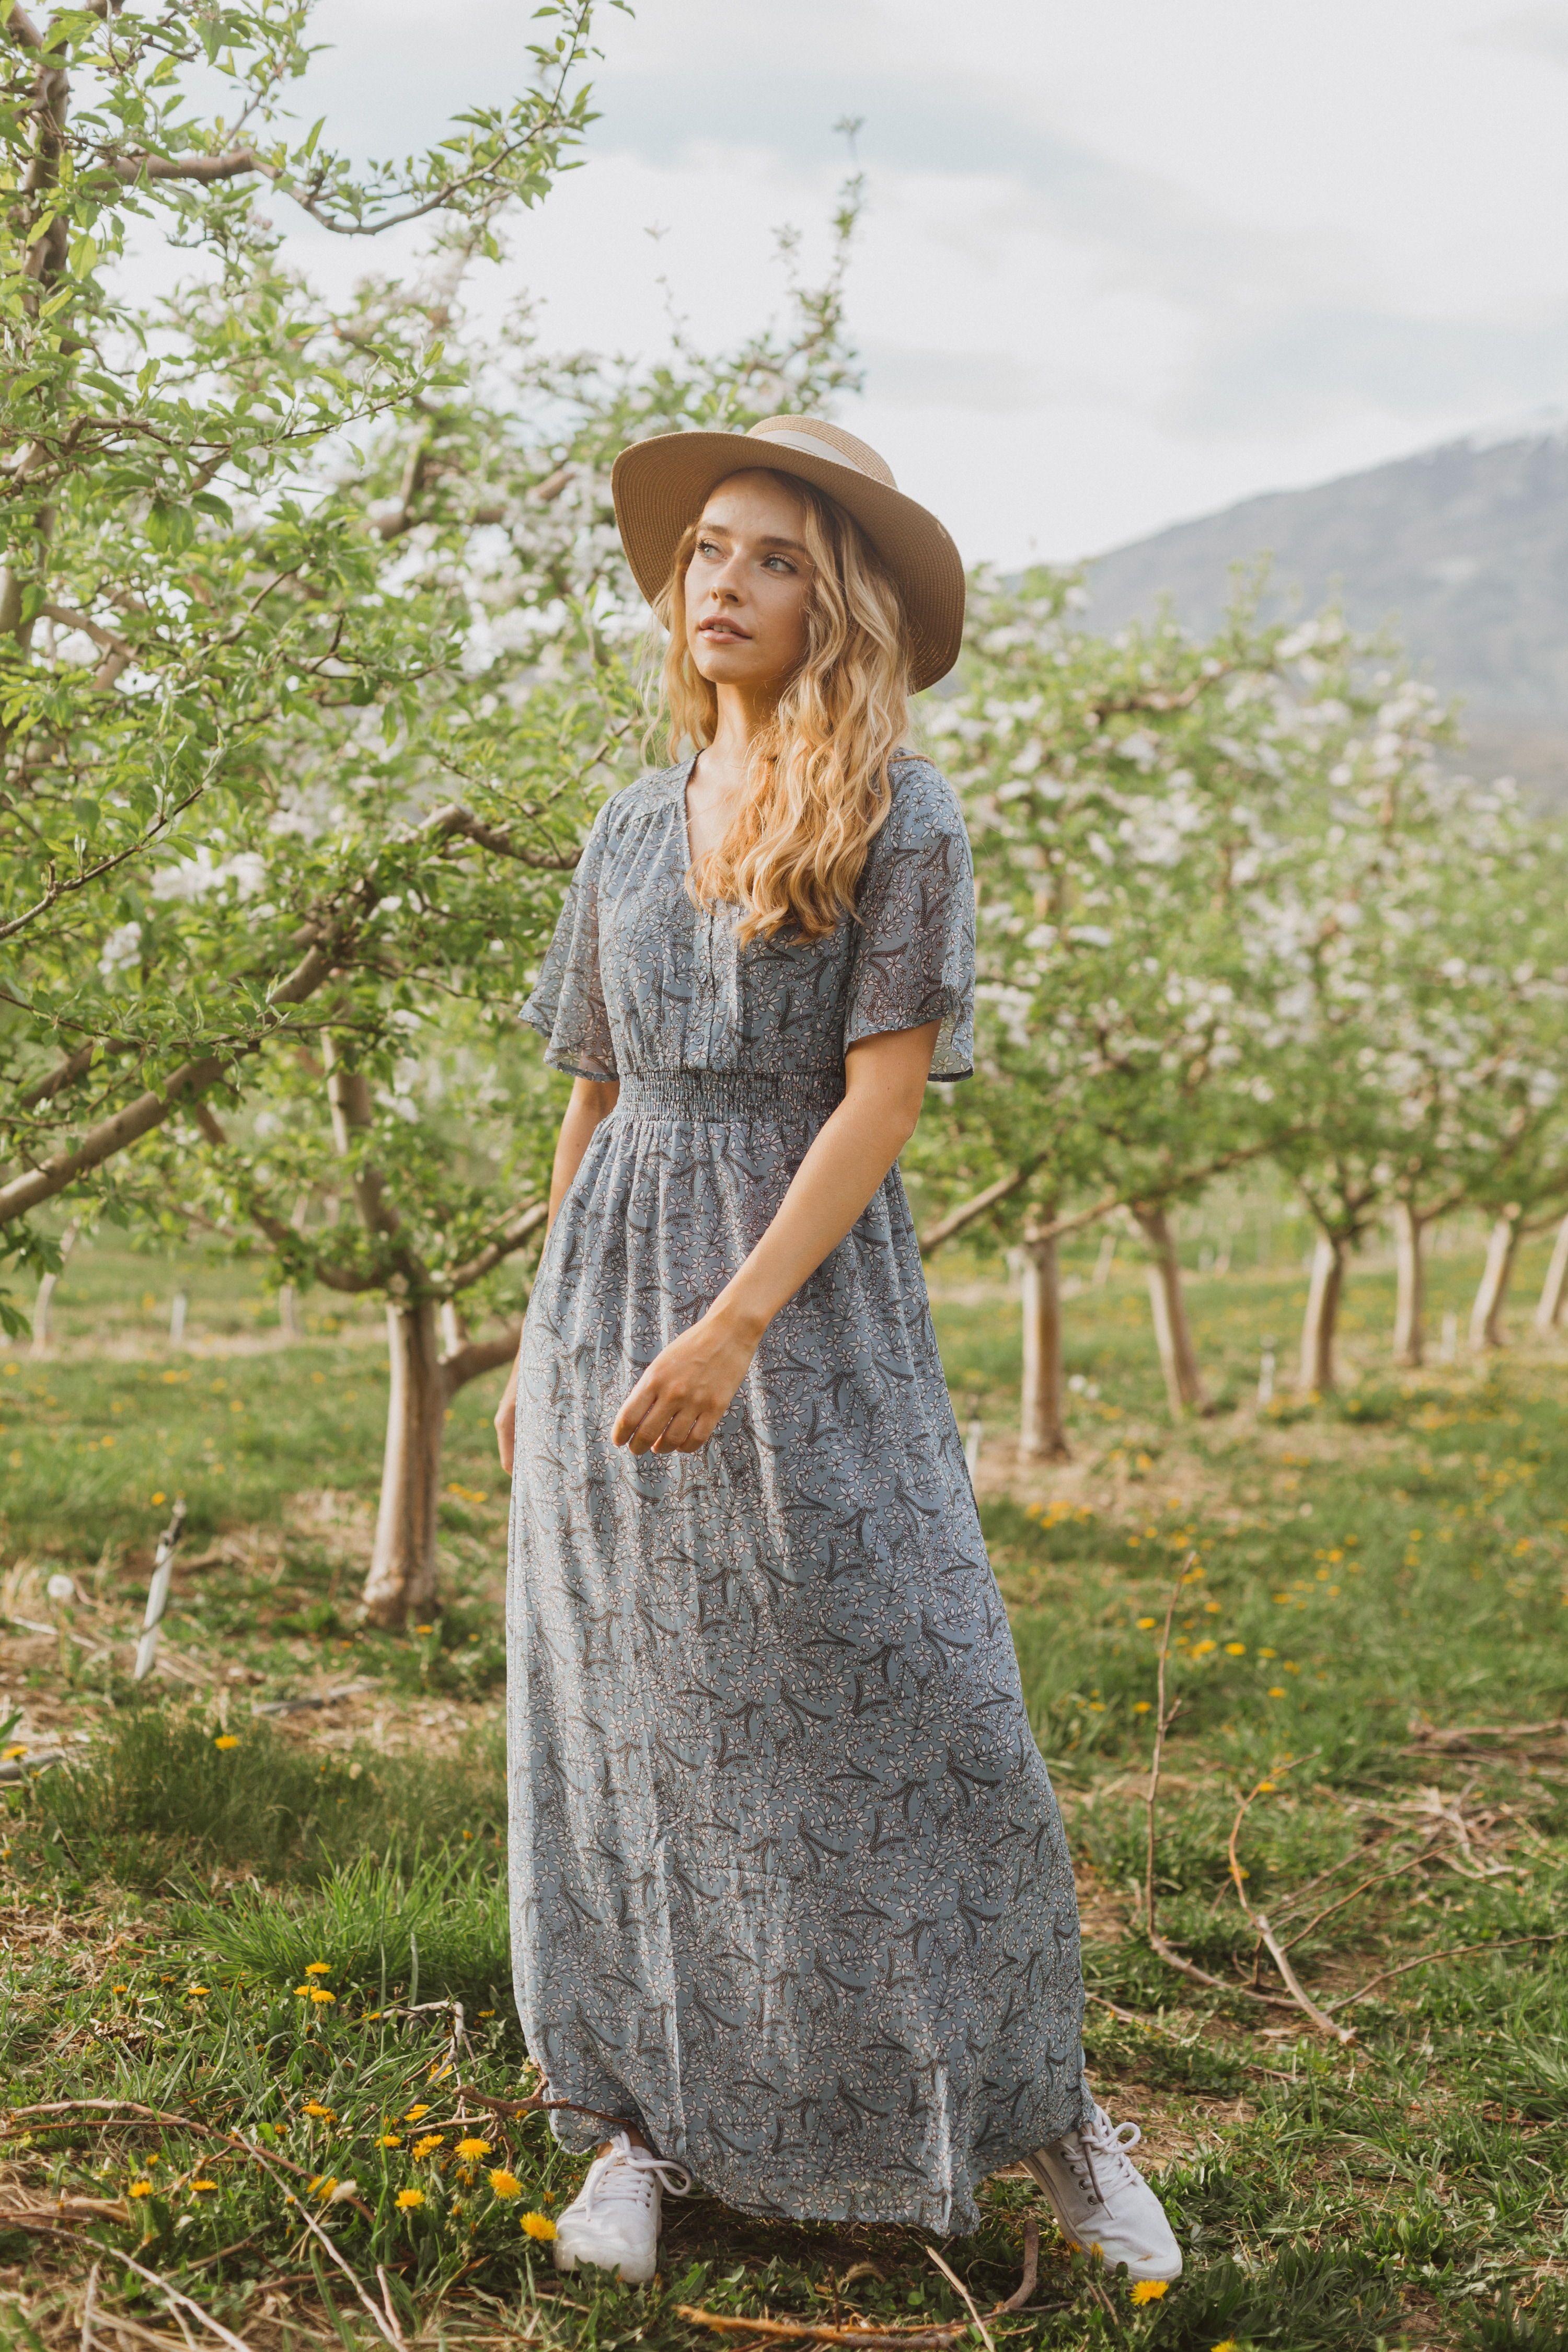 The Liana Floral Smocked Dress In Blue Dresses Smocked Dress Summer Linen Dresses [ 4500 x 3000 Pixel ]